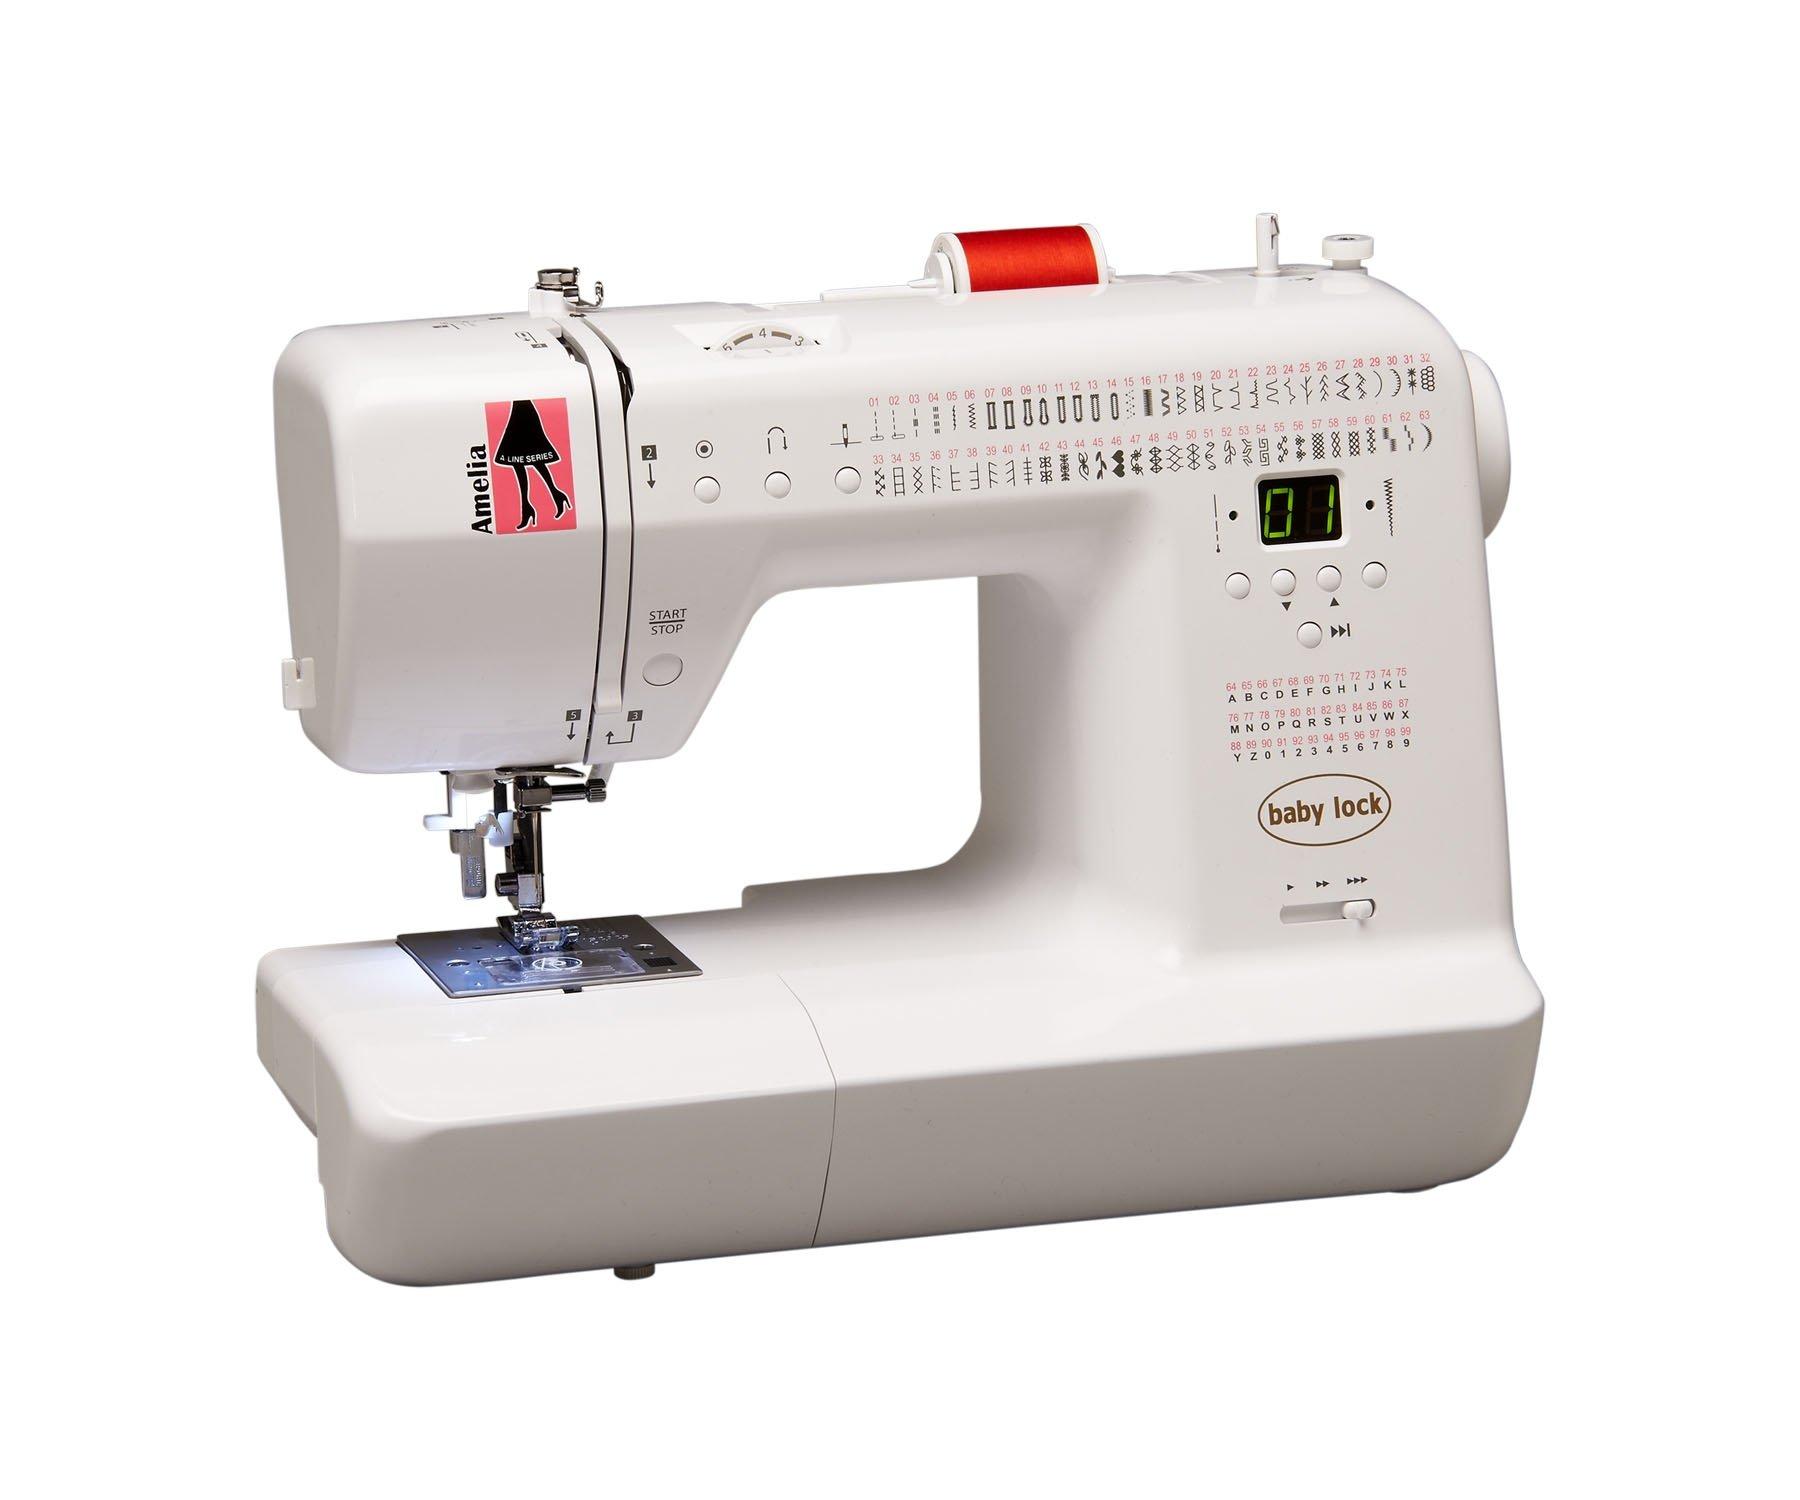 baby lock sewing machine bl9